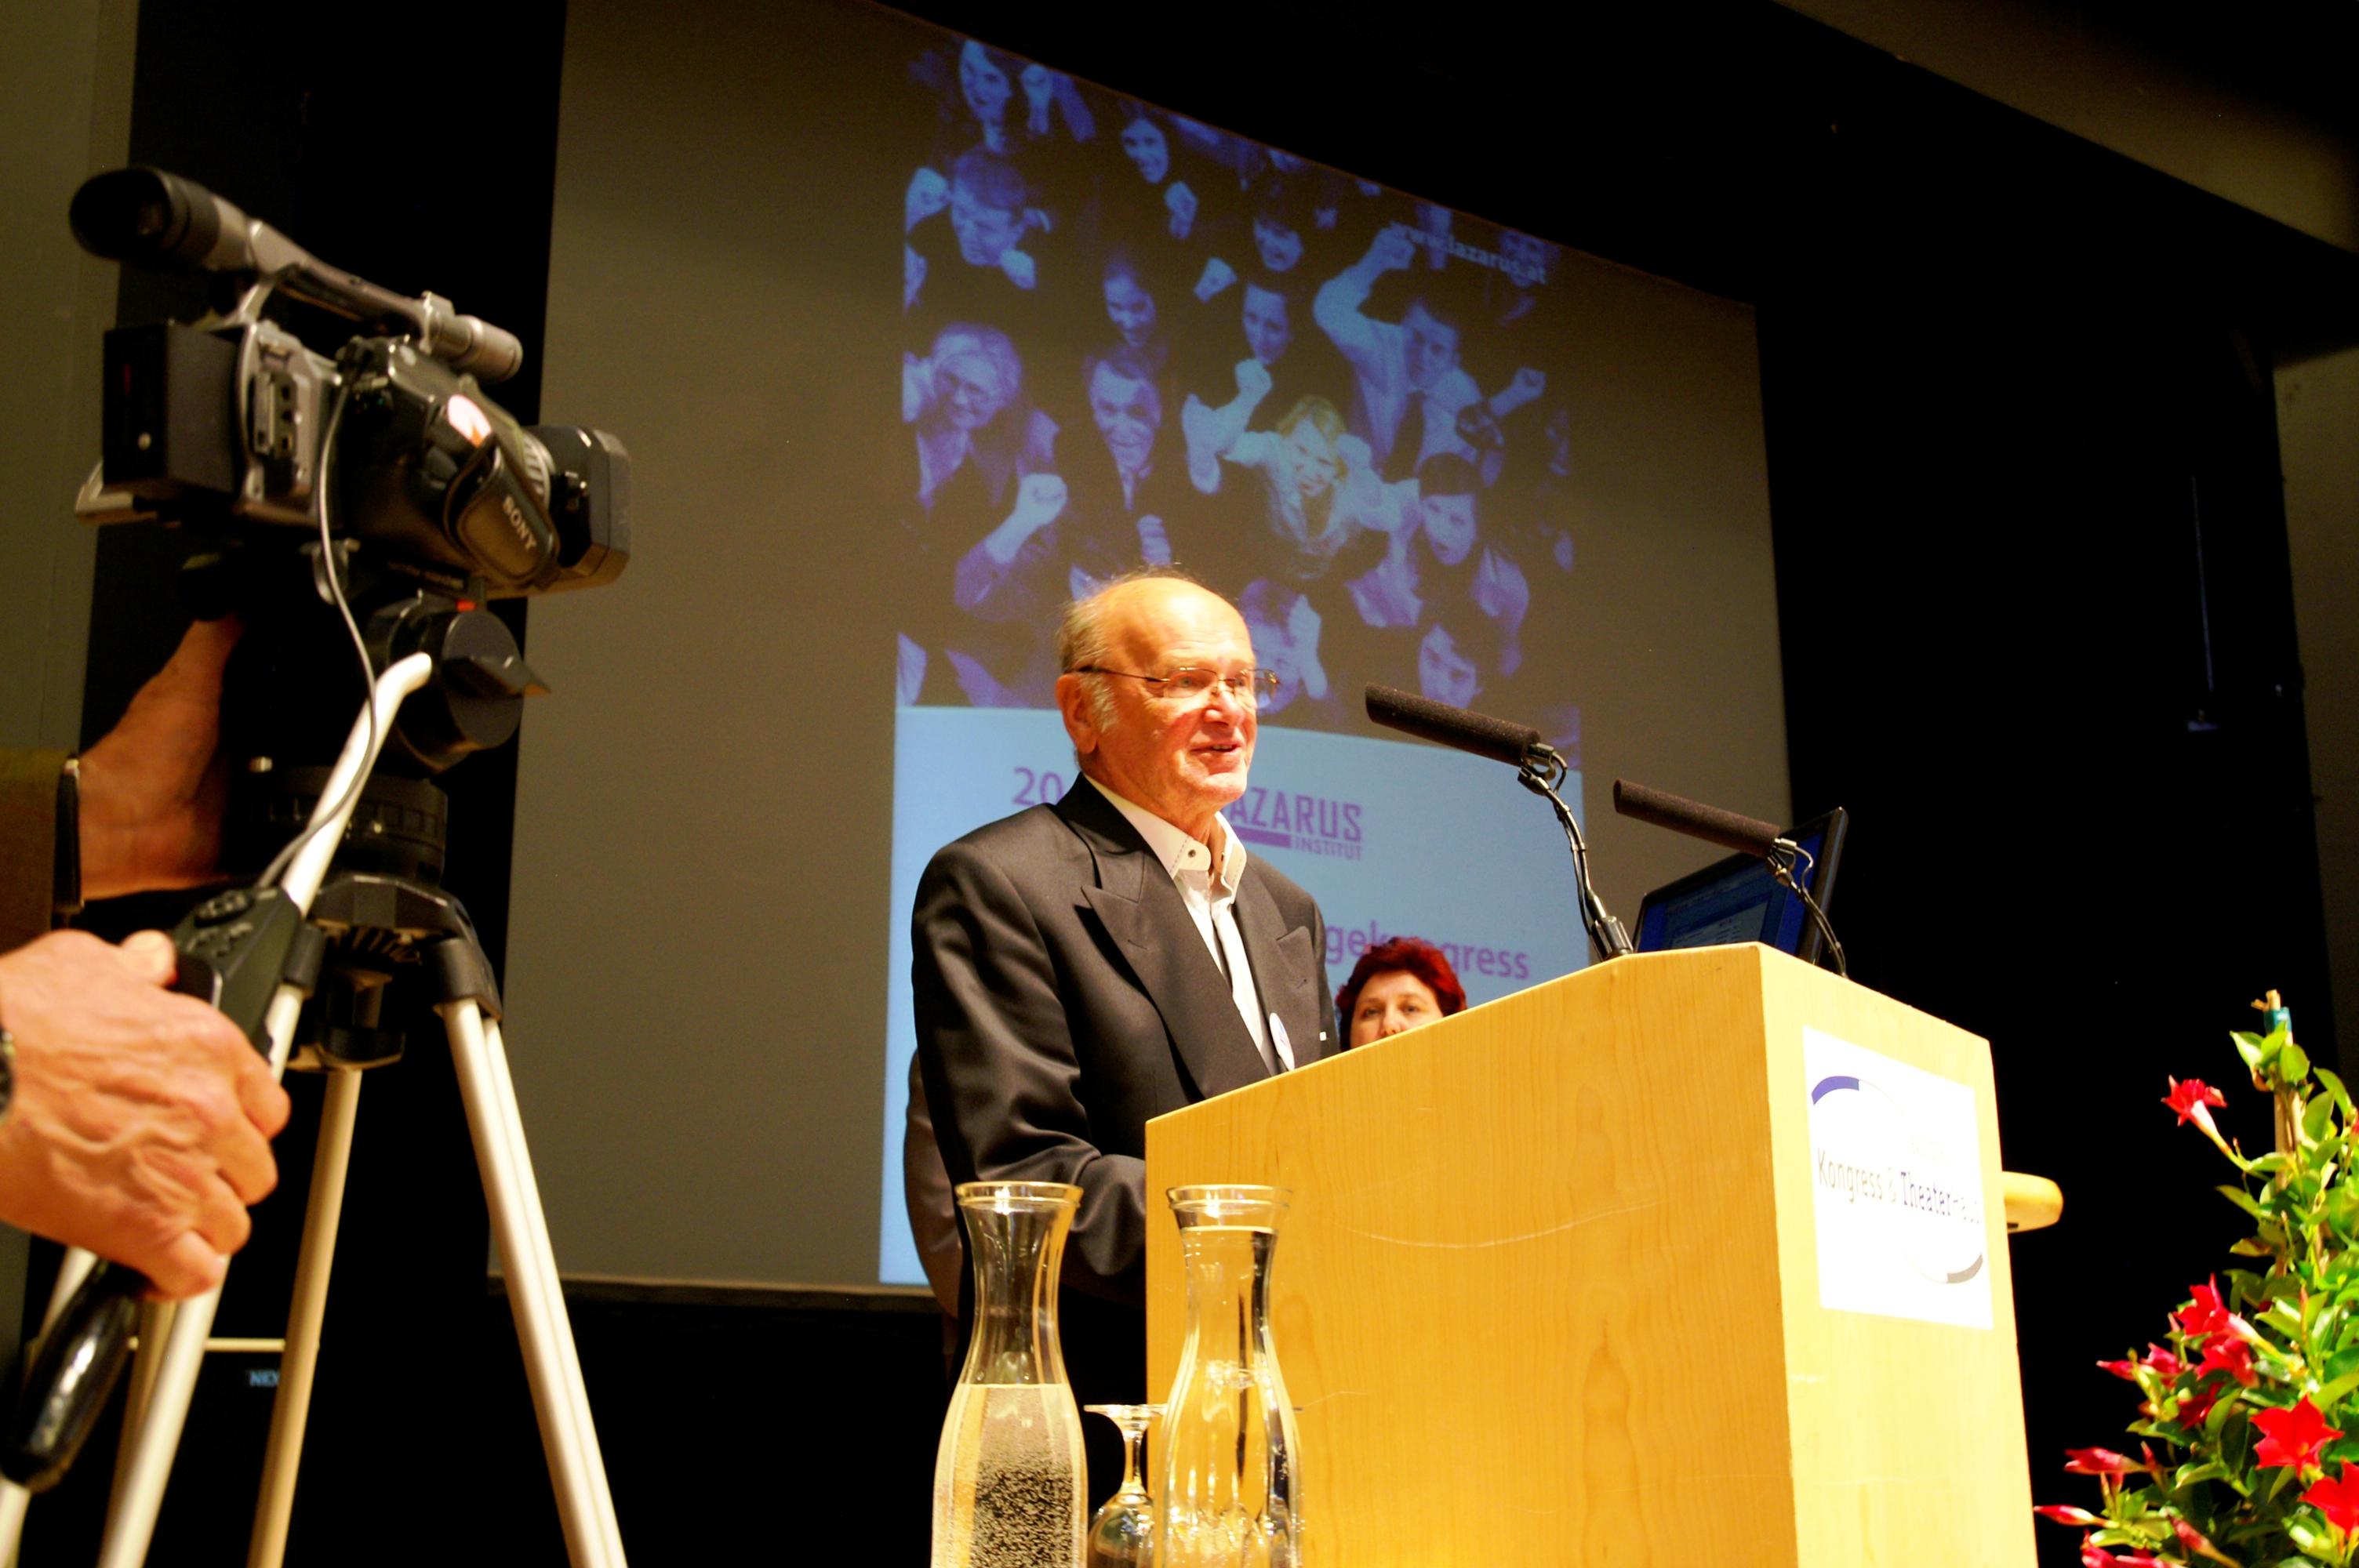 Prof. Erwin Böhm - Pflegeforschungspreis 2012